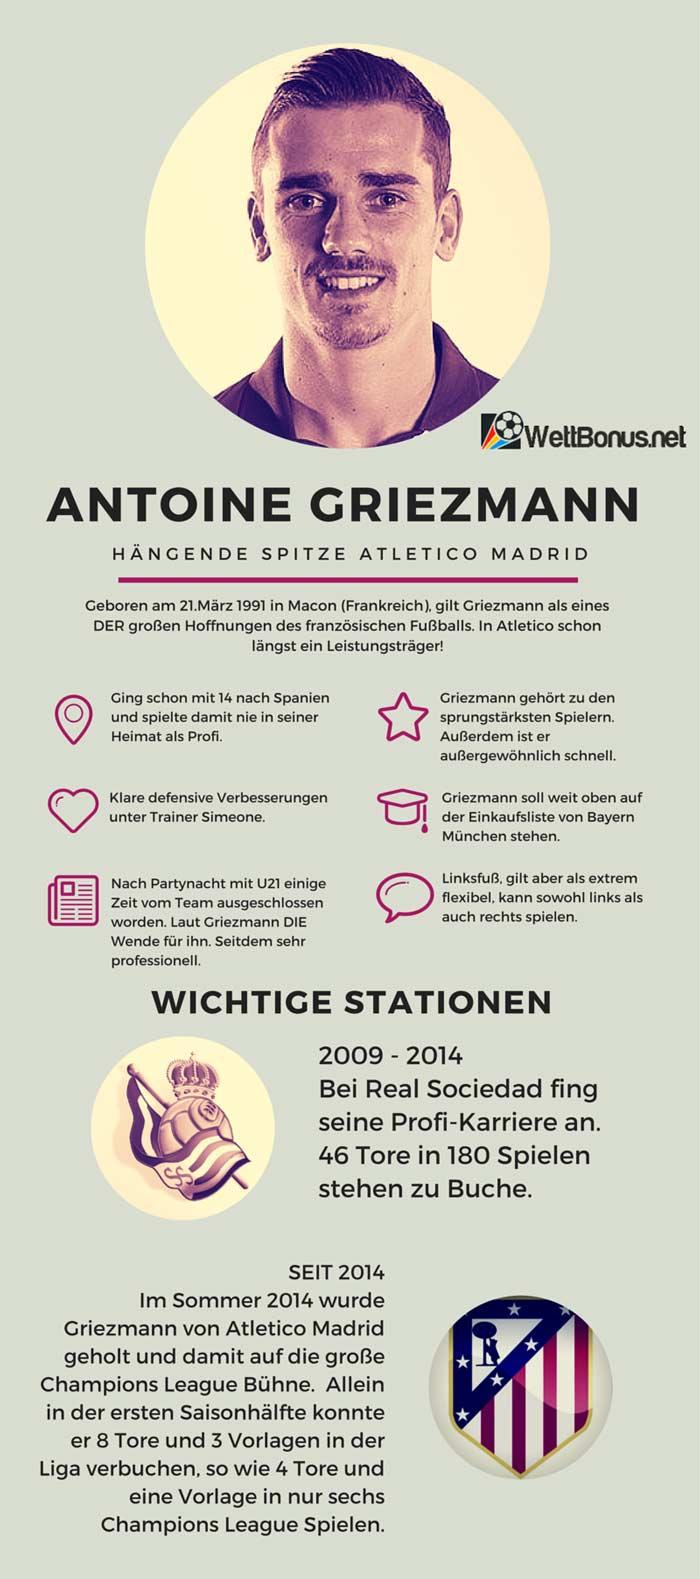 Antoine Griezmann Info